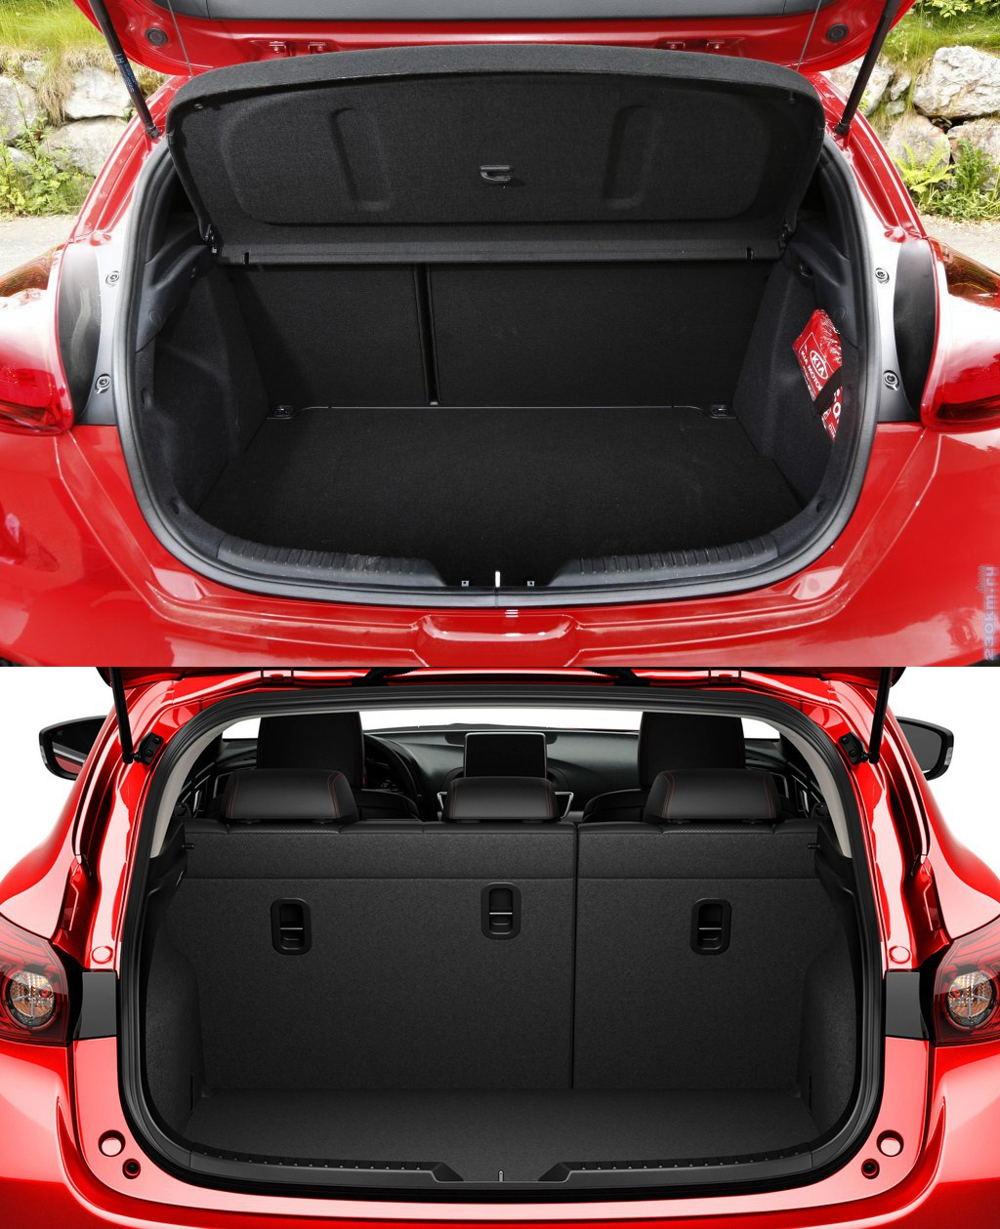 Багажник Kia Ceed и Mazda 3